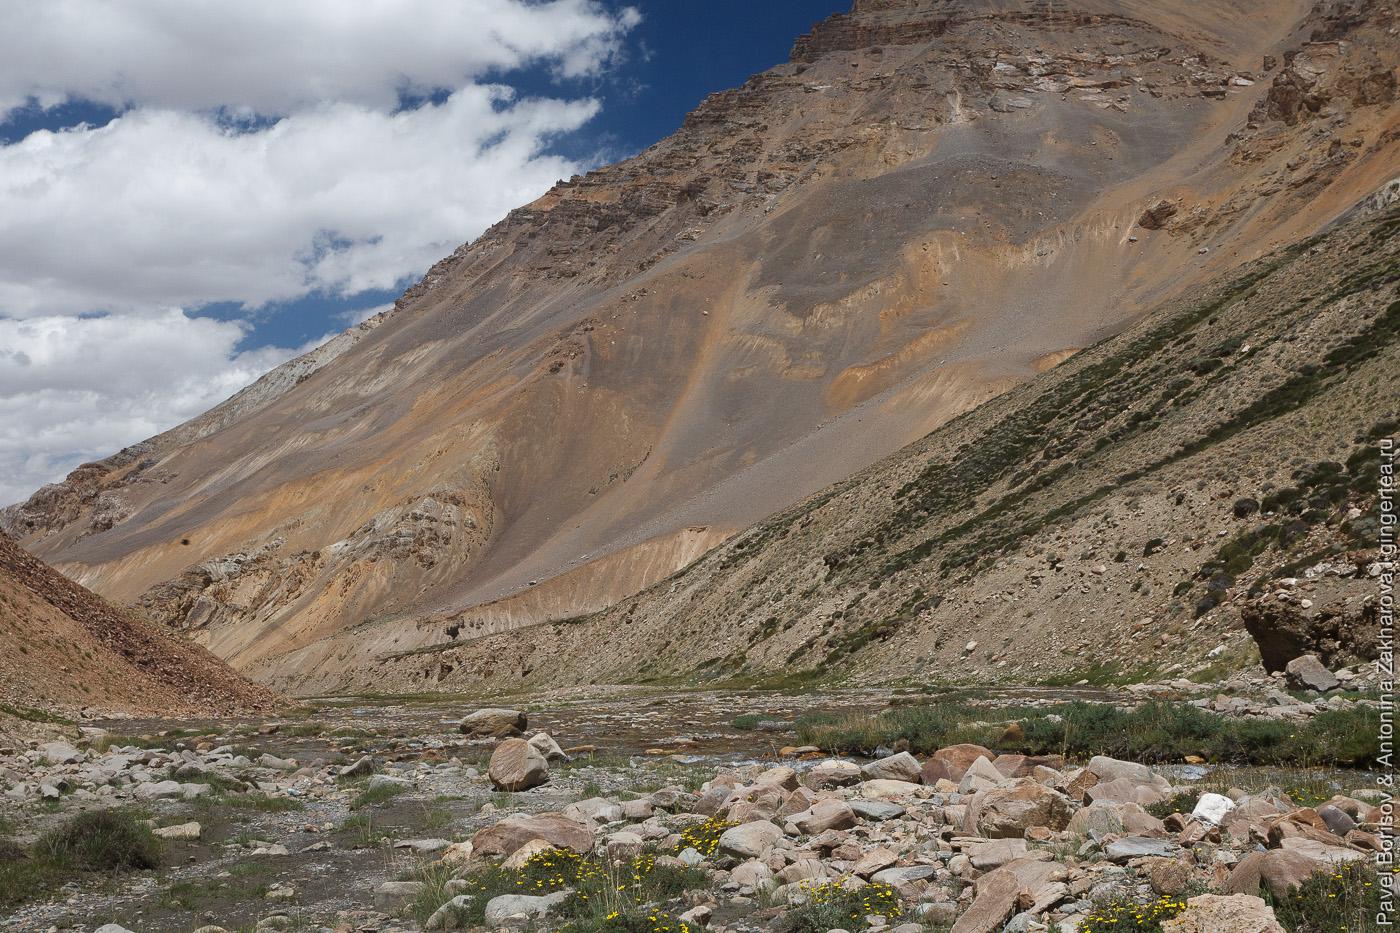 Река Сарчу, Индийские Гималаи